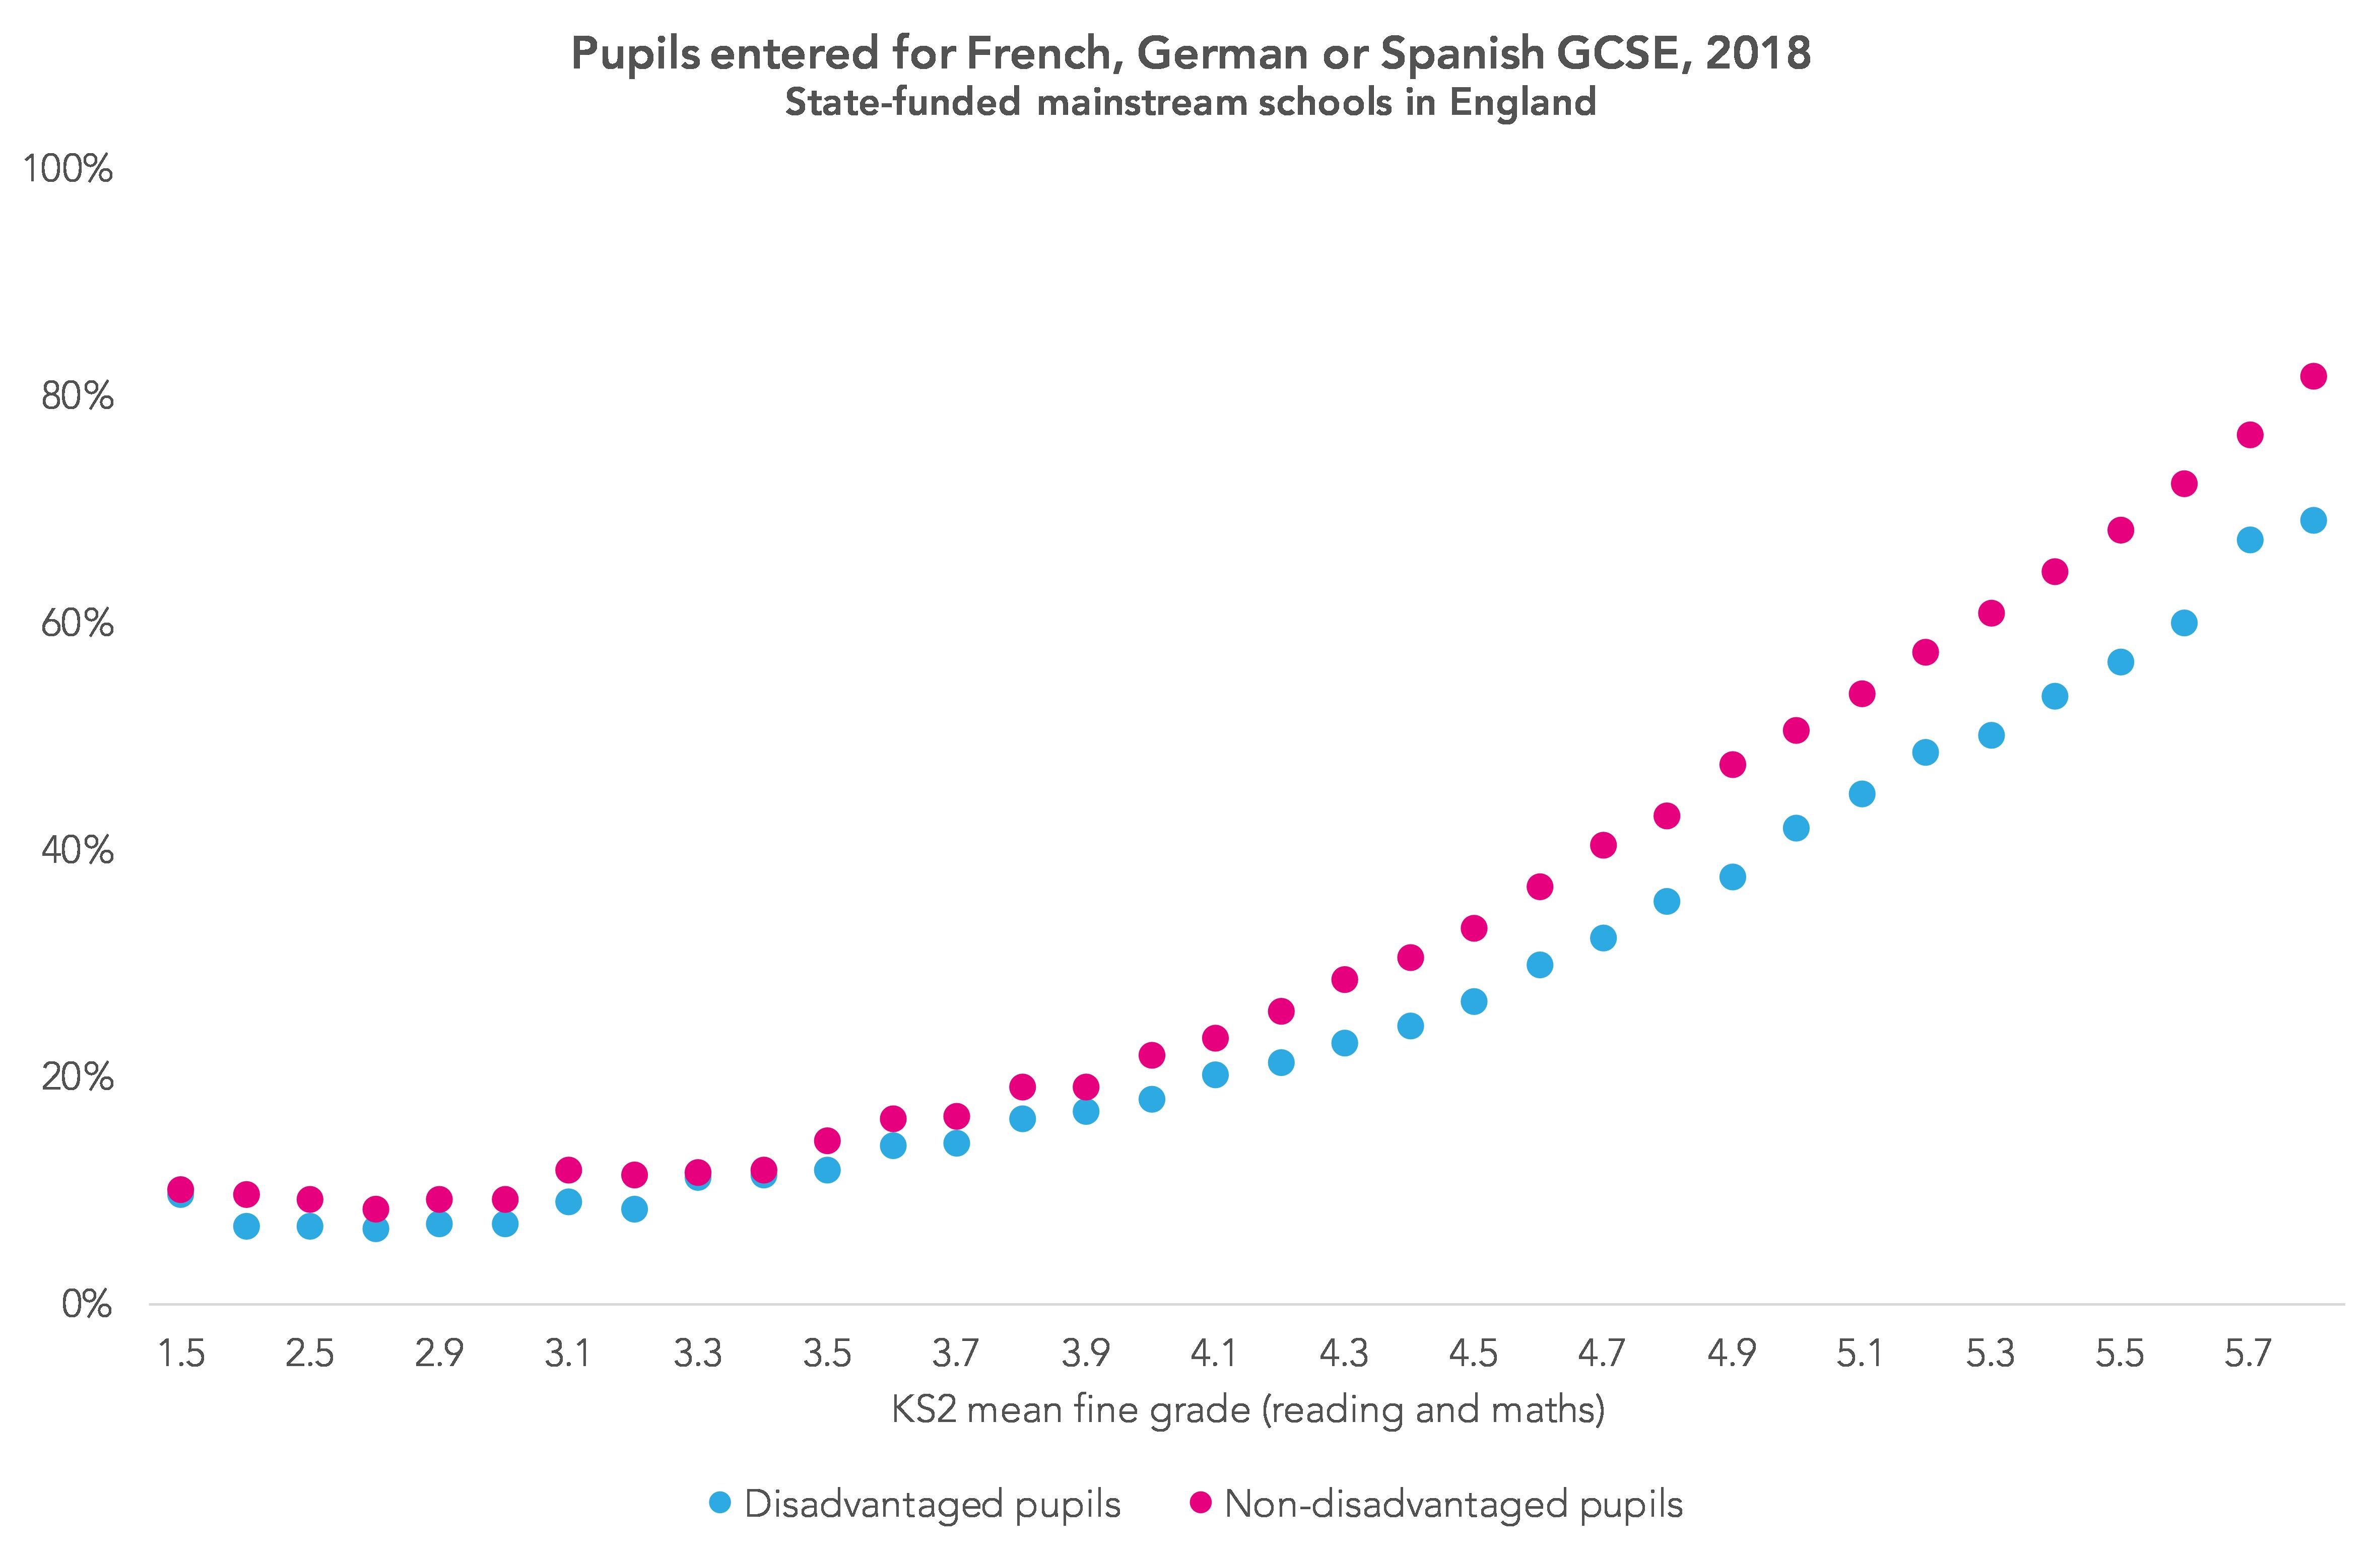 Pupils entered for French, German or Spanish GCSE